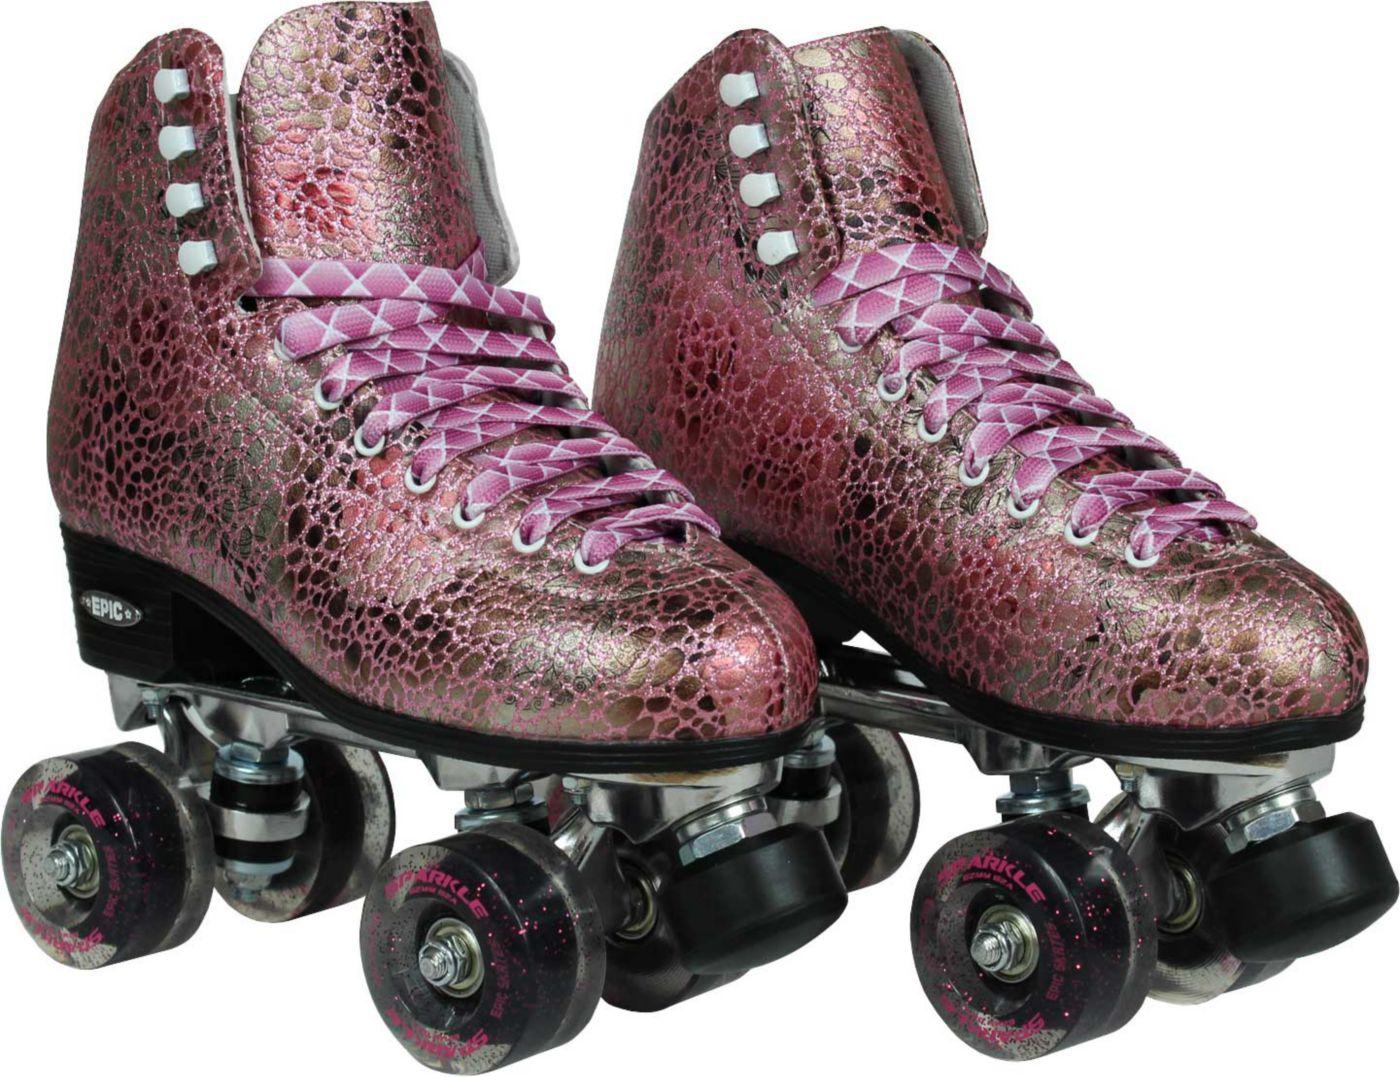 Epic Women's Sparkle Quad Roller Skates